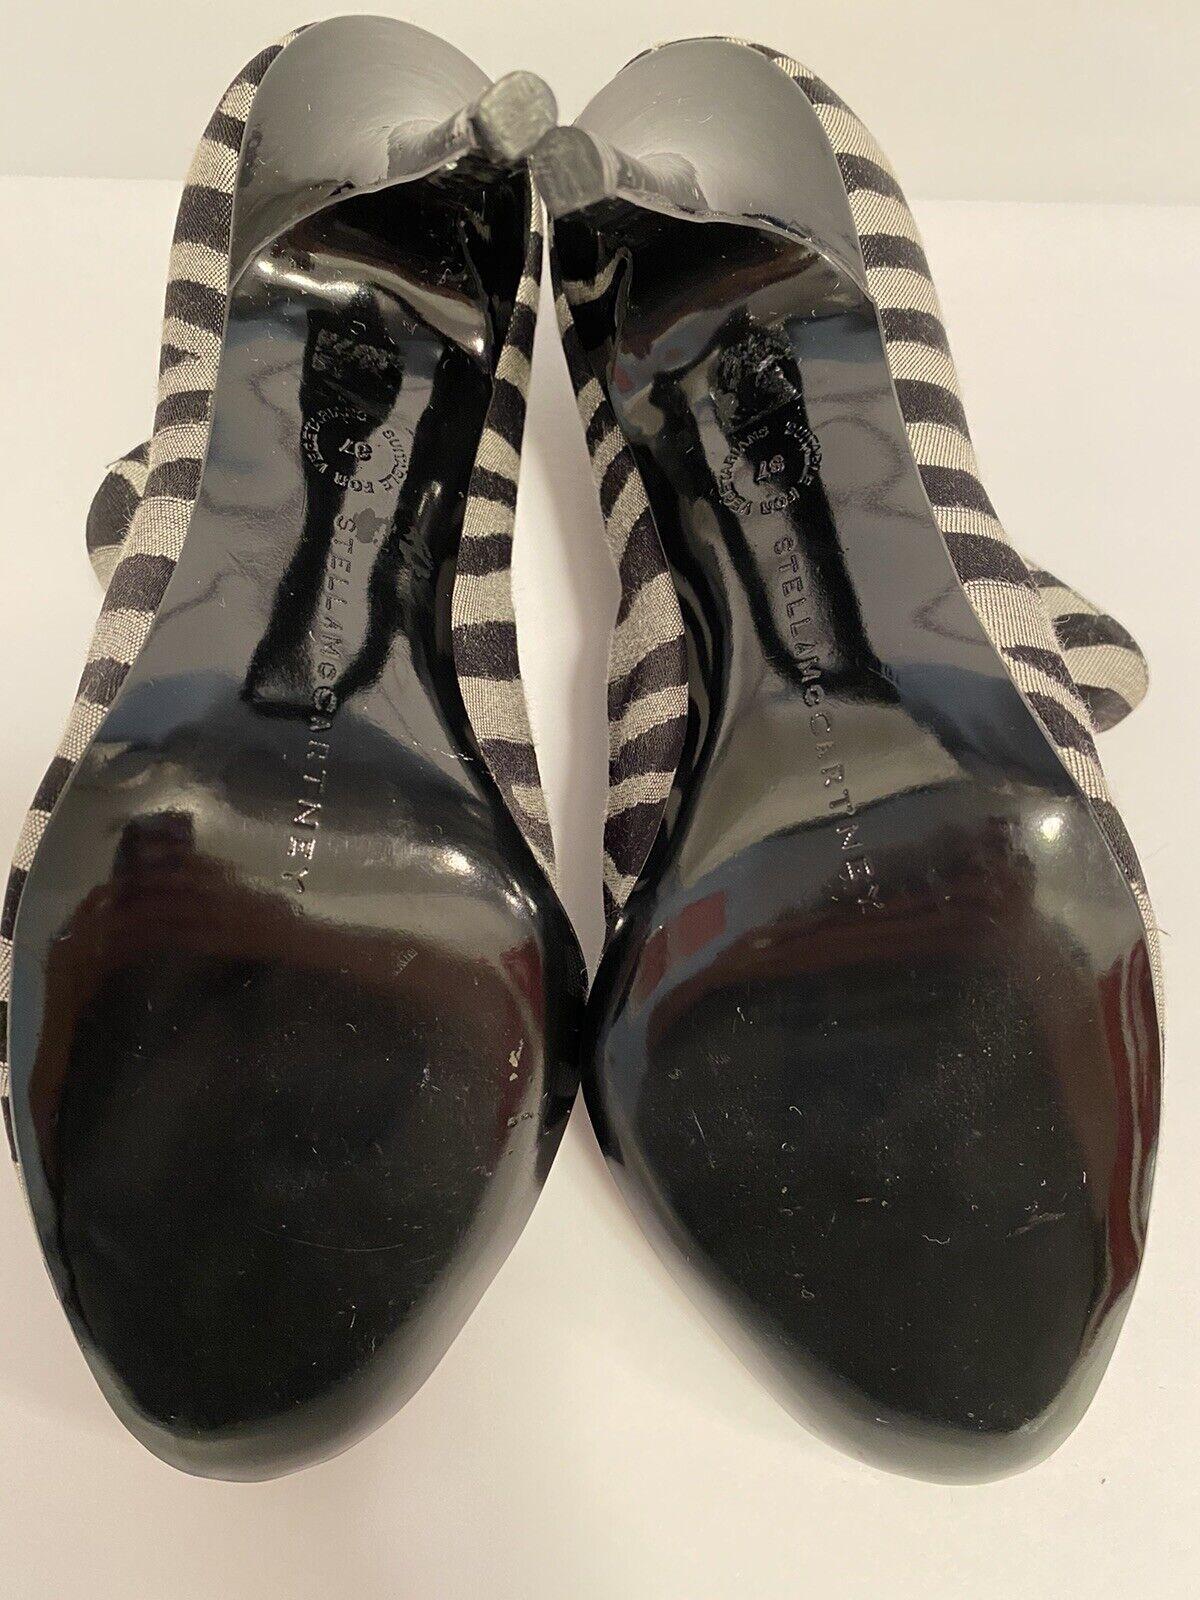 Stella McCartney Zebra Striped Boots Size 36 - image 8